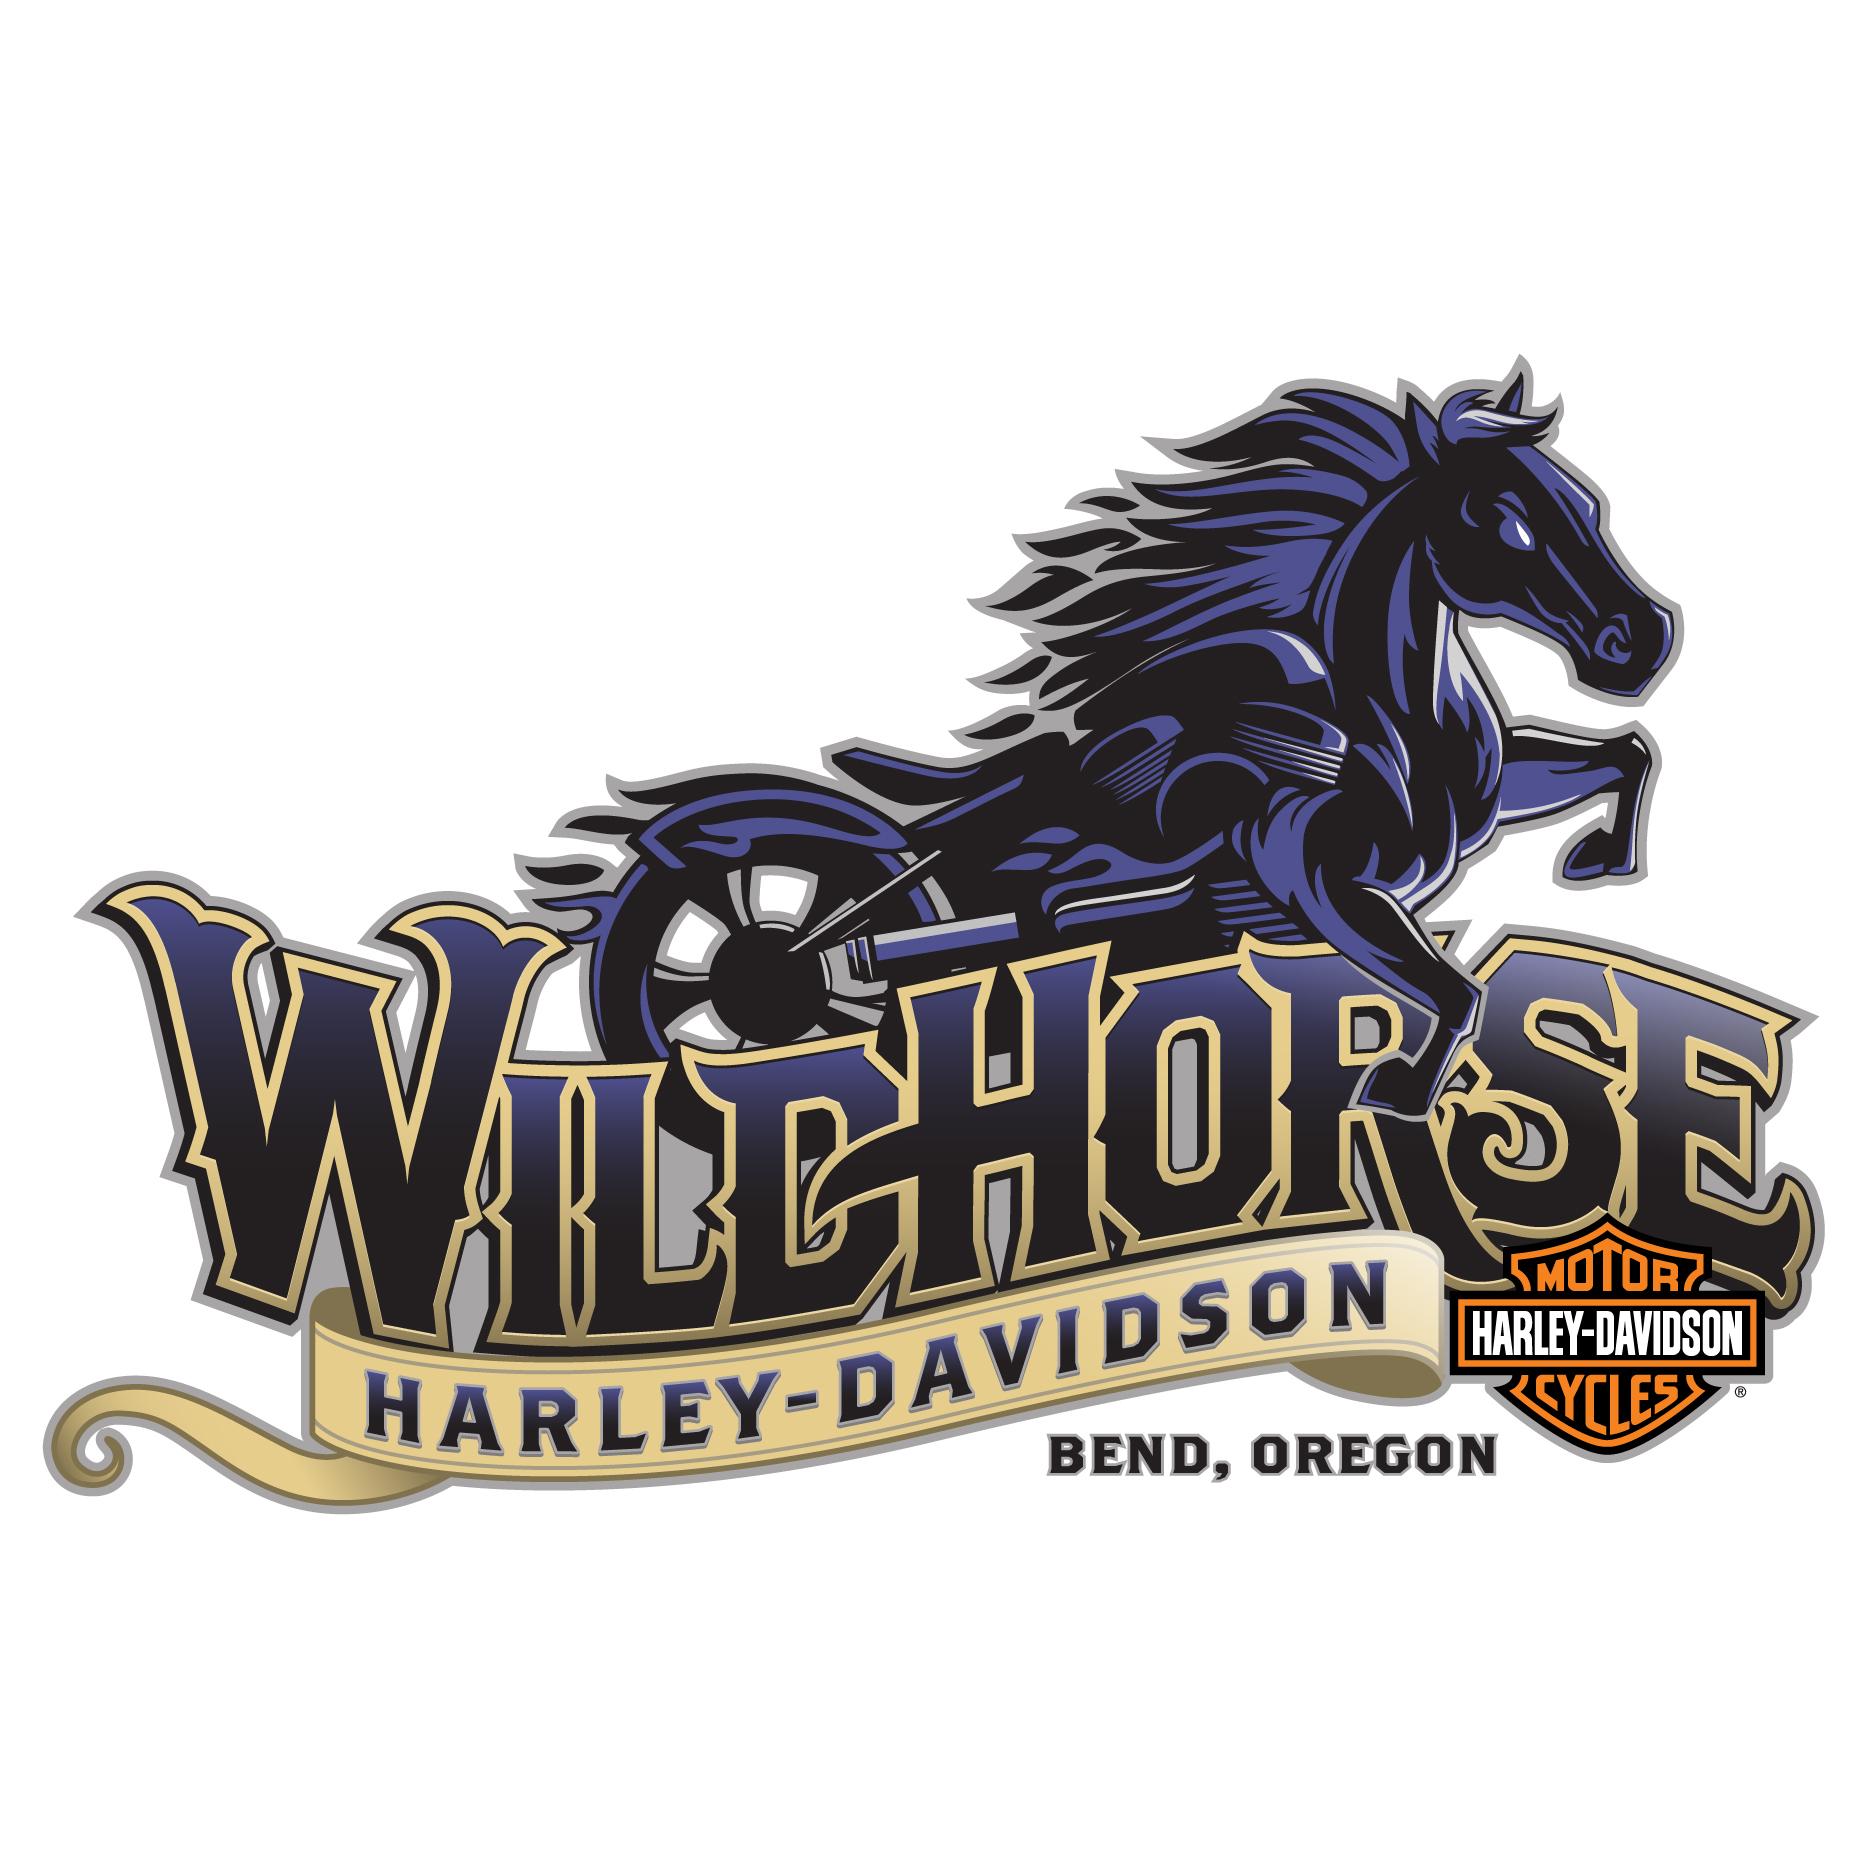 wildhorse harley-davidson in bend, or - (541) 330-6